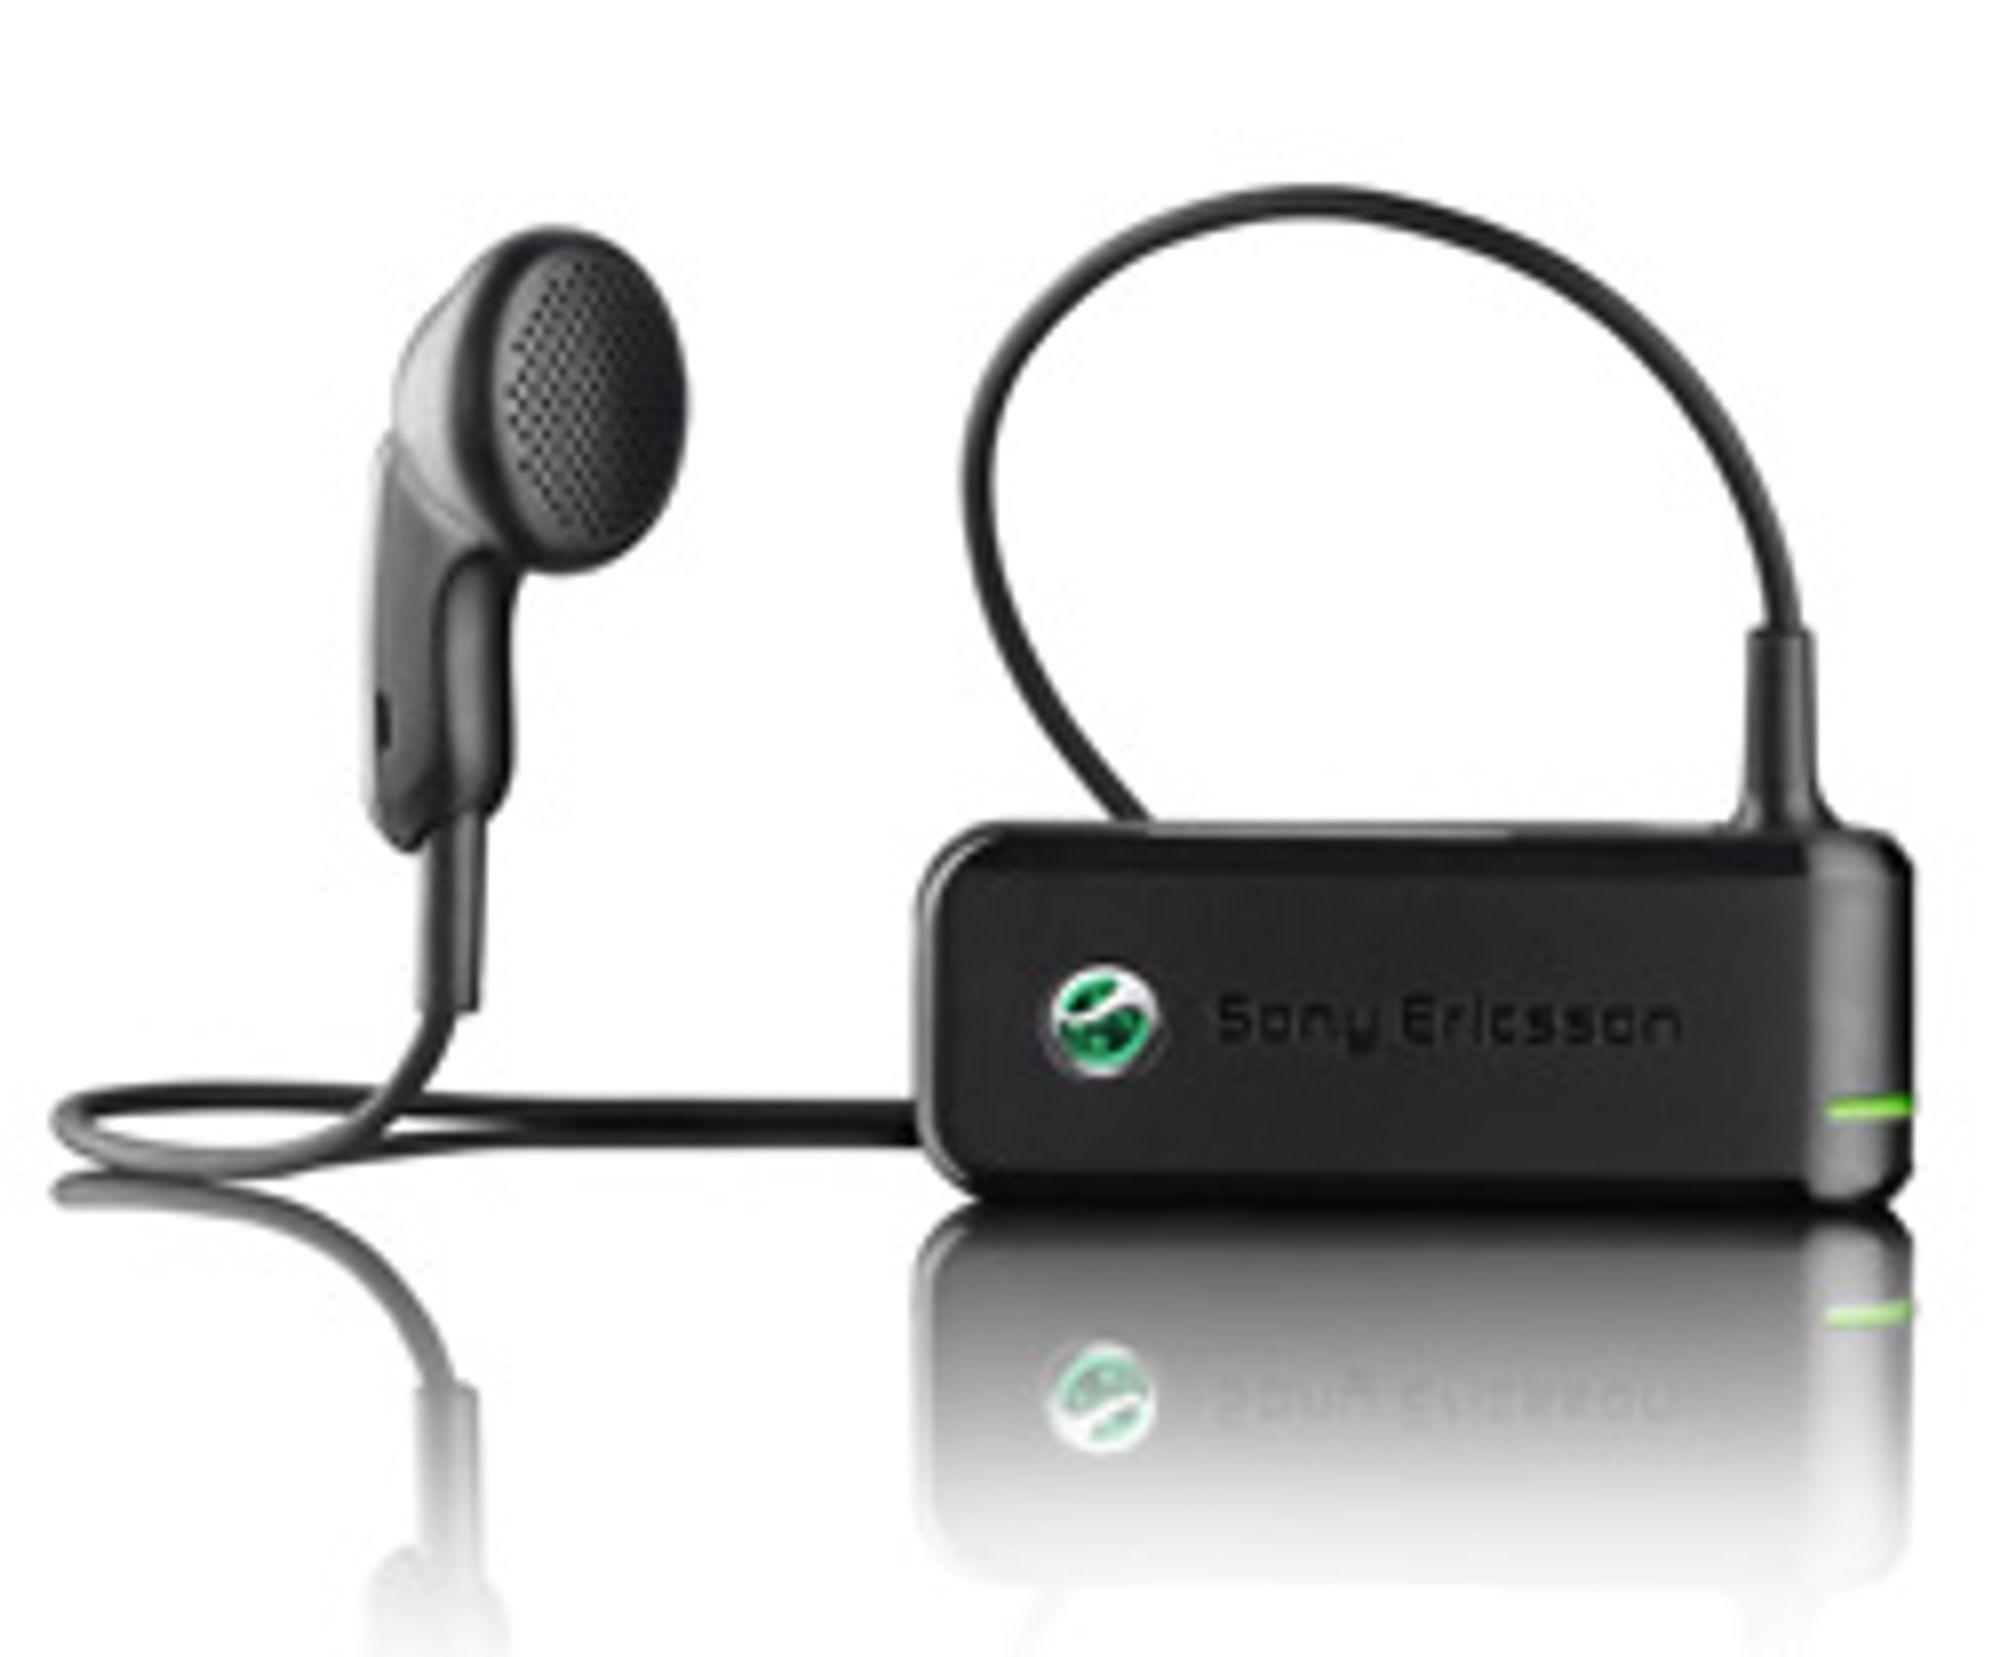 VH300 fra Sony Ericsson. (Alle foto: Sony Ericsson)